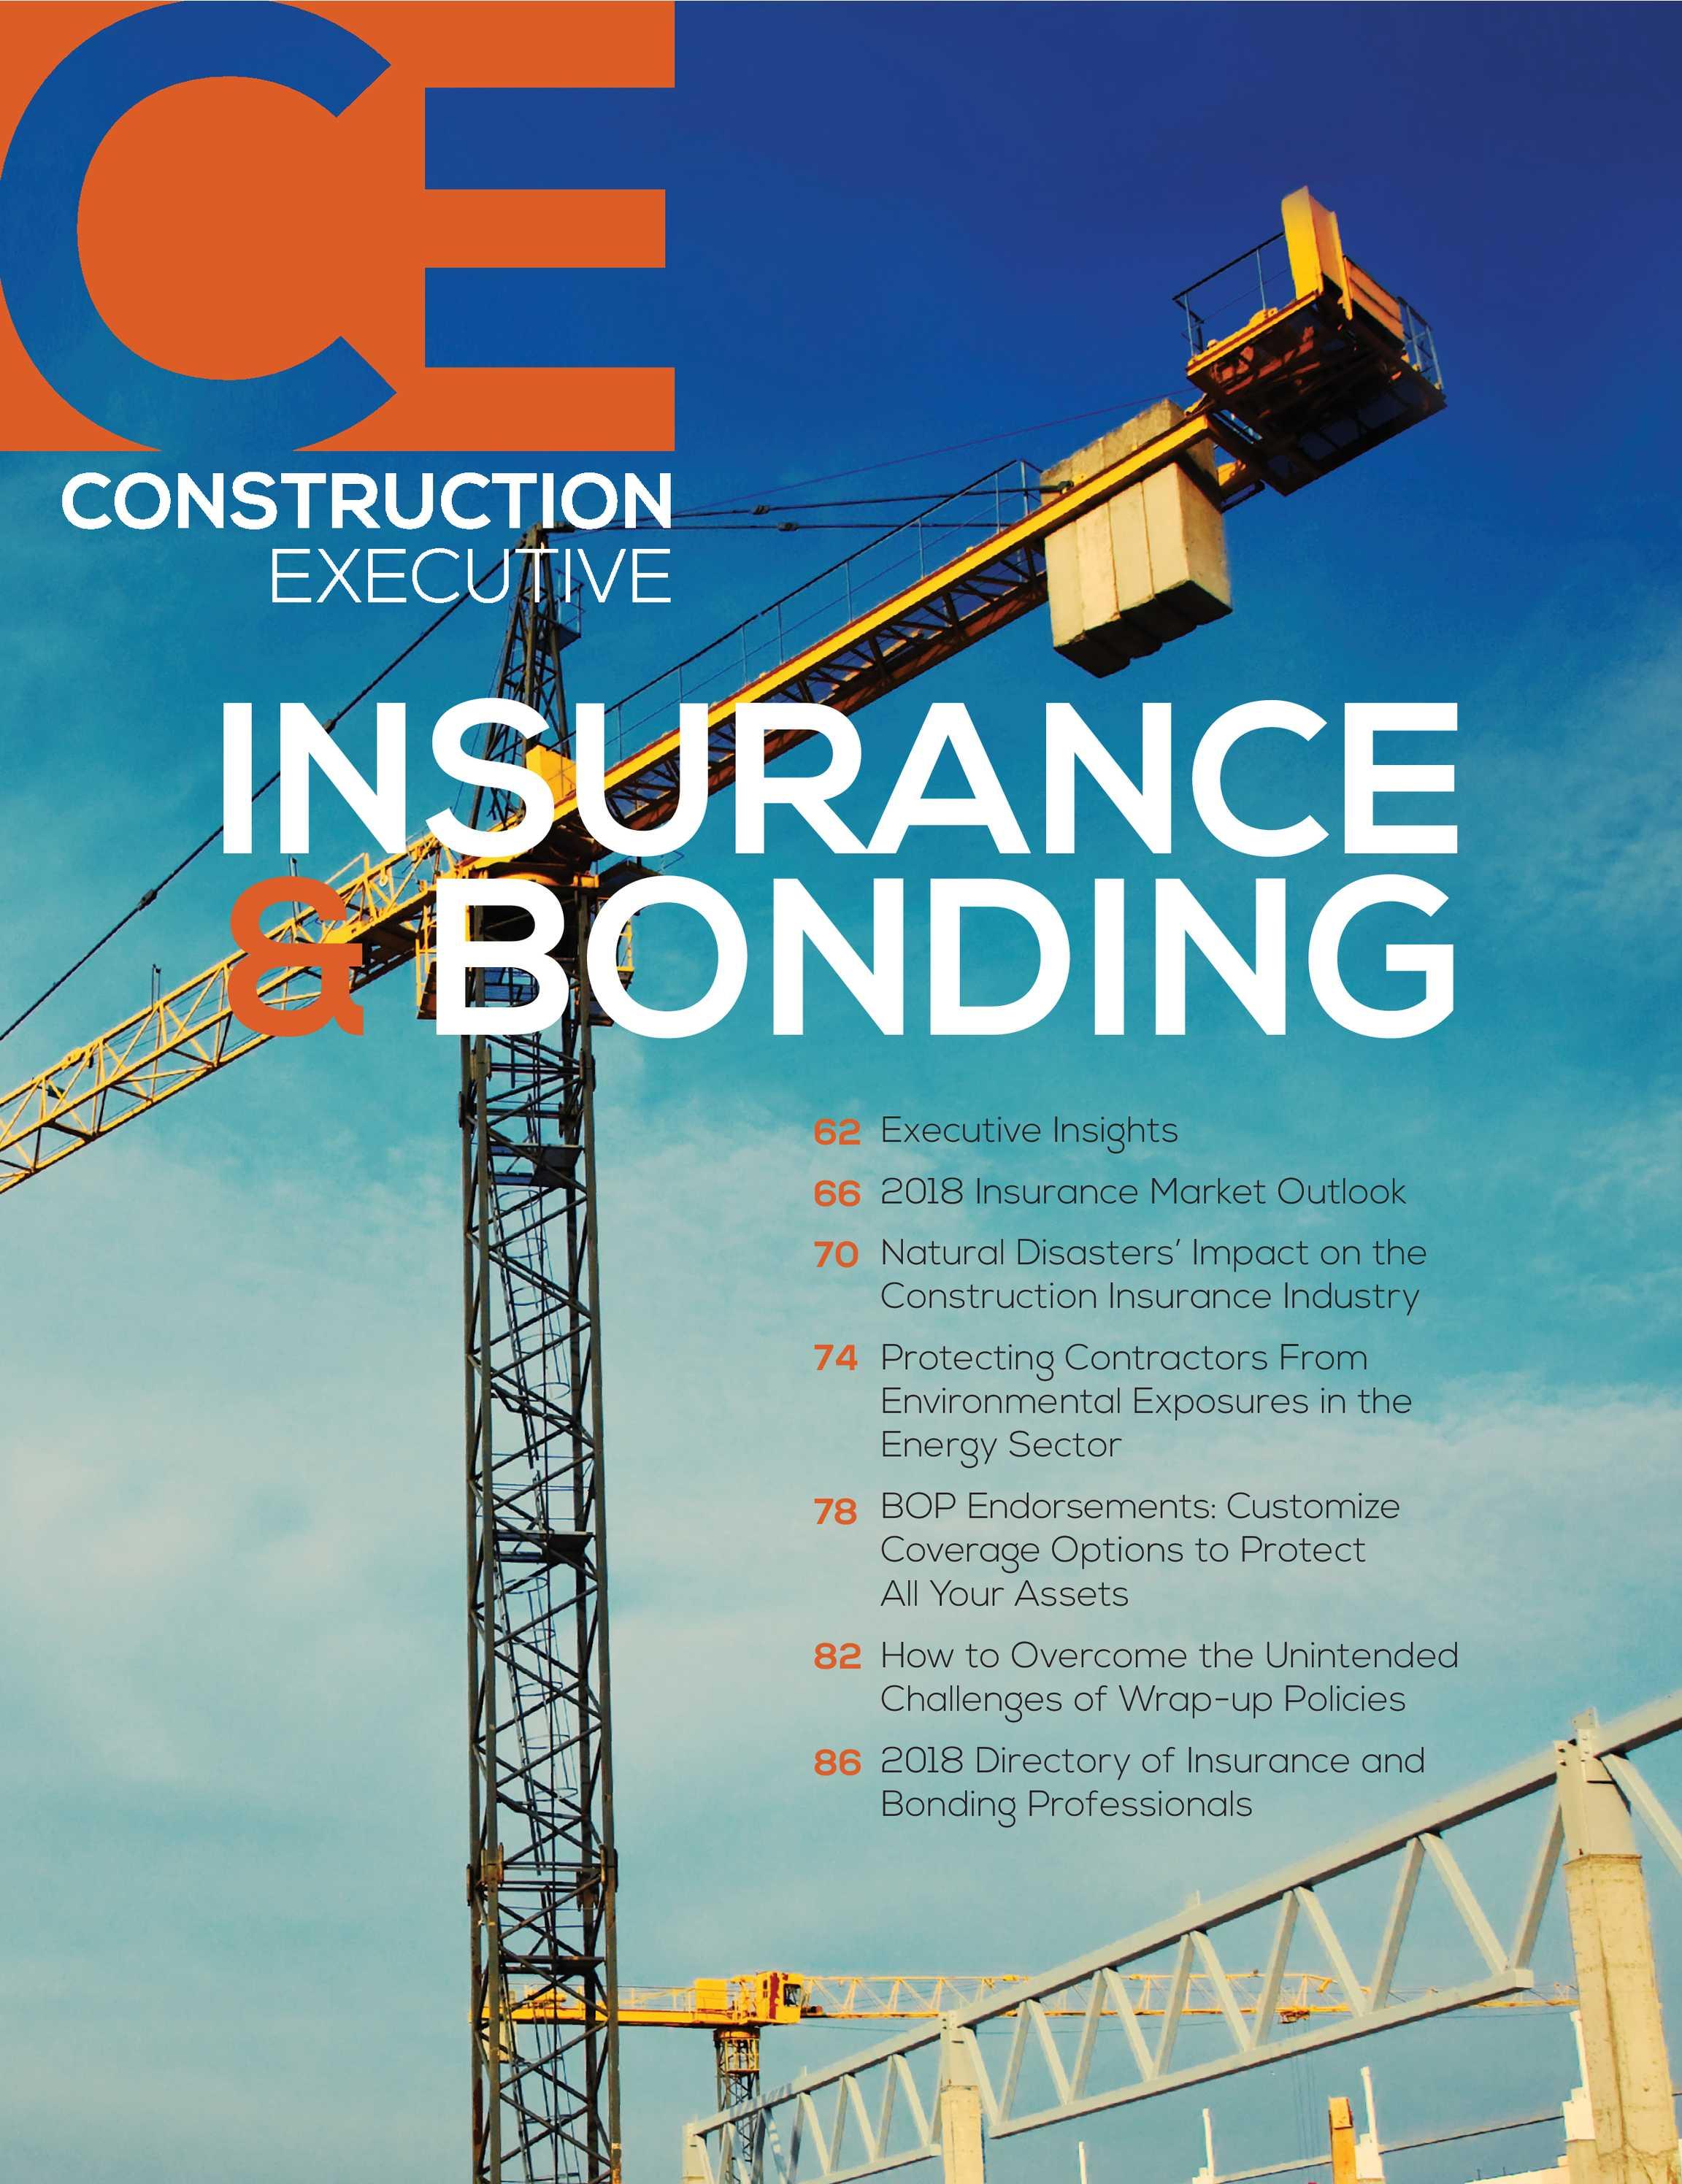 Construction Executive Magazine - April 2018 - page 61